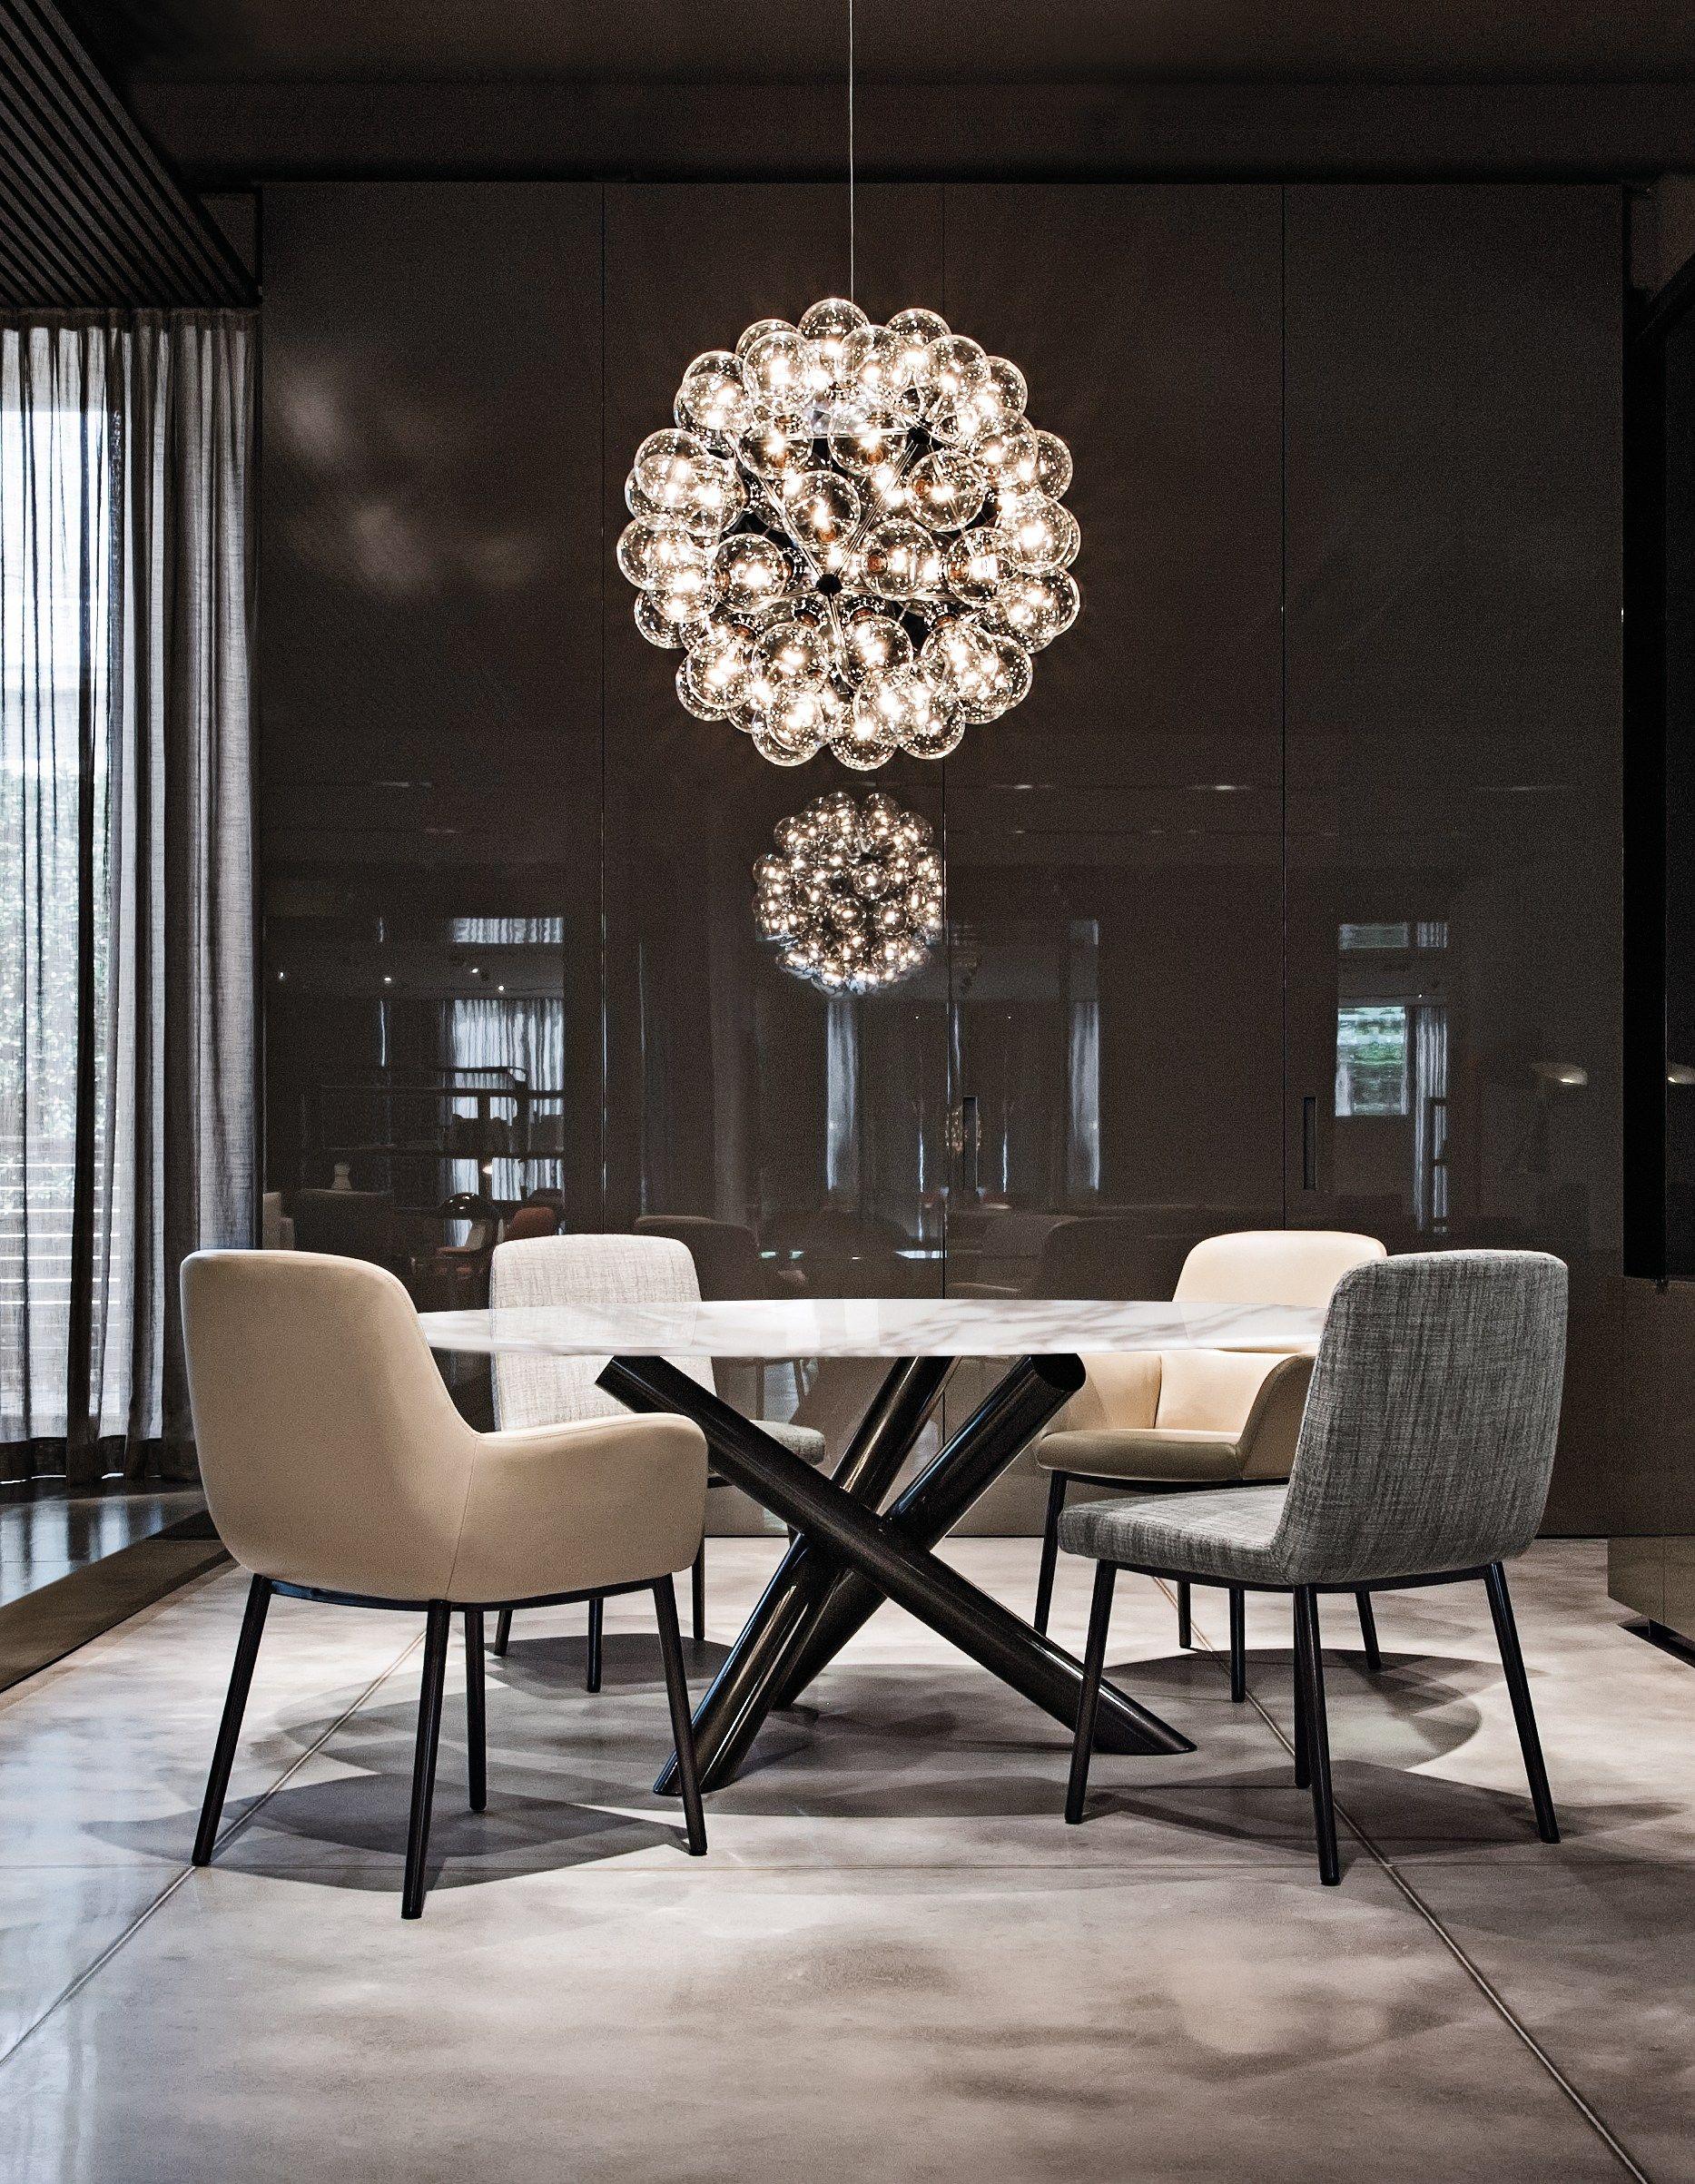 Van dyck by minotti design rodolfo dordoni - Minotti tisch ...